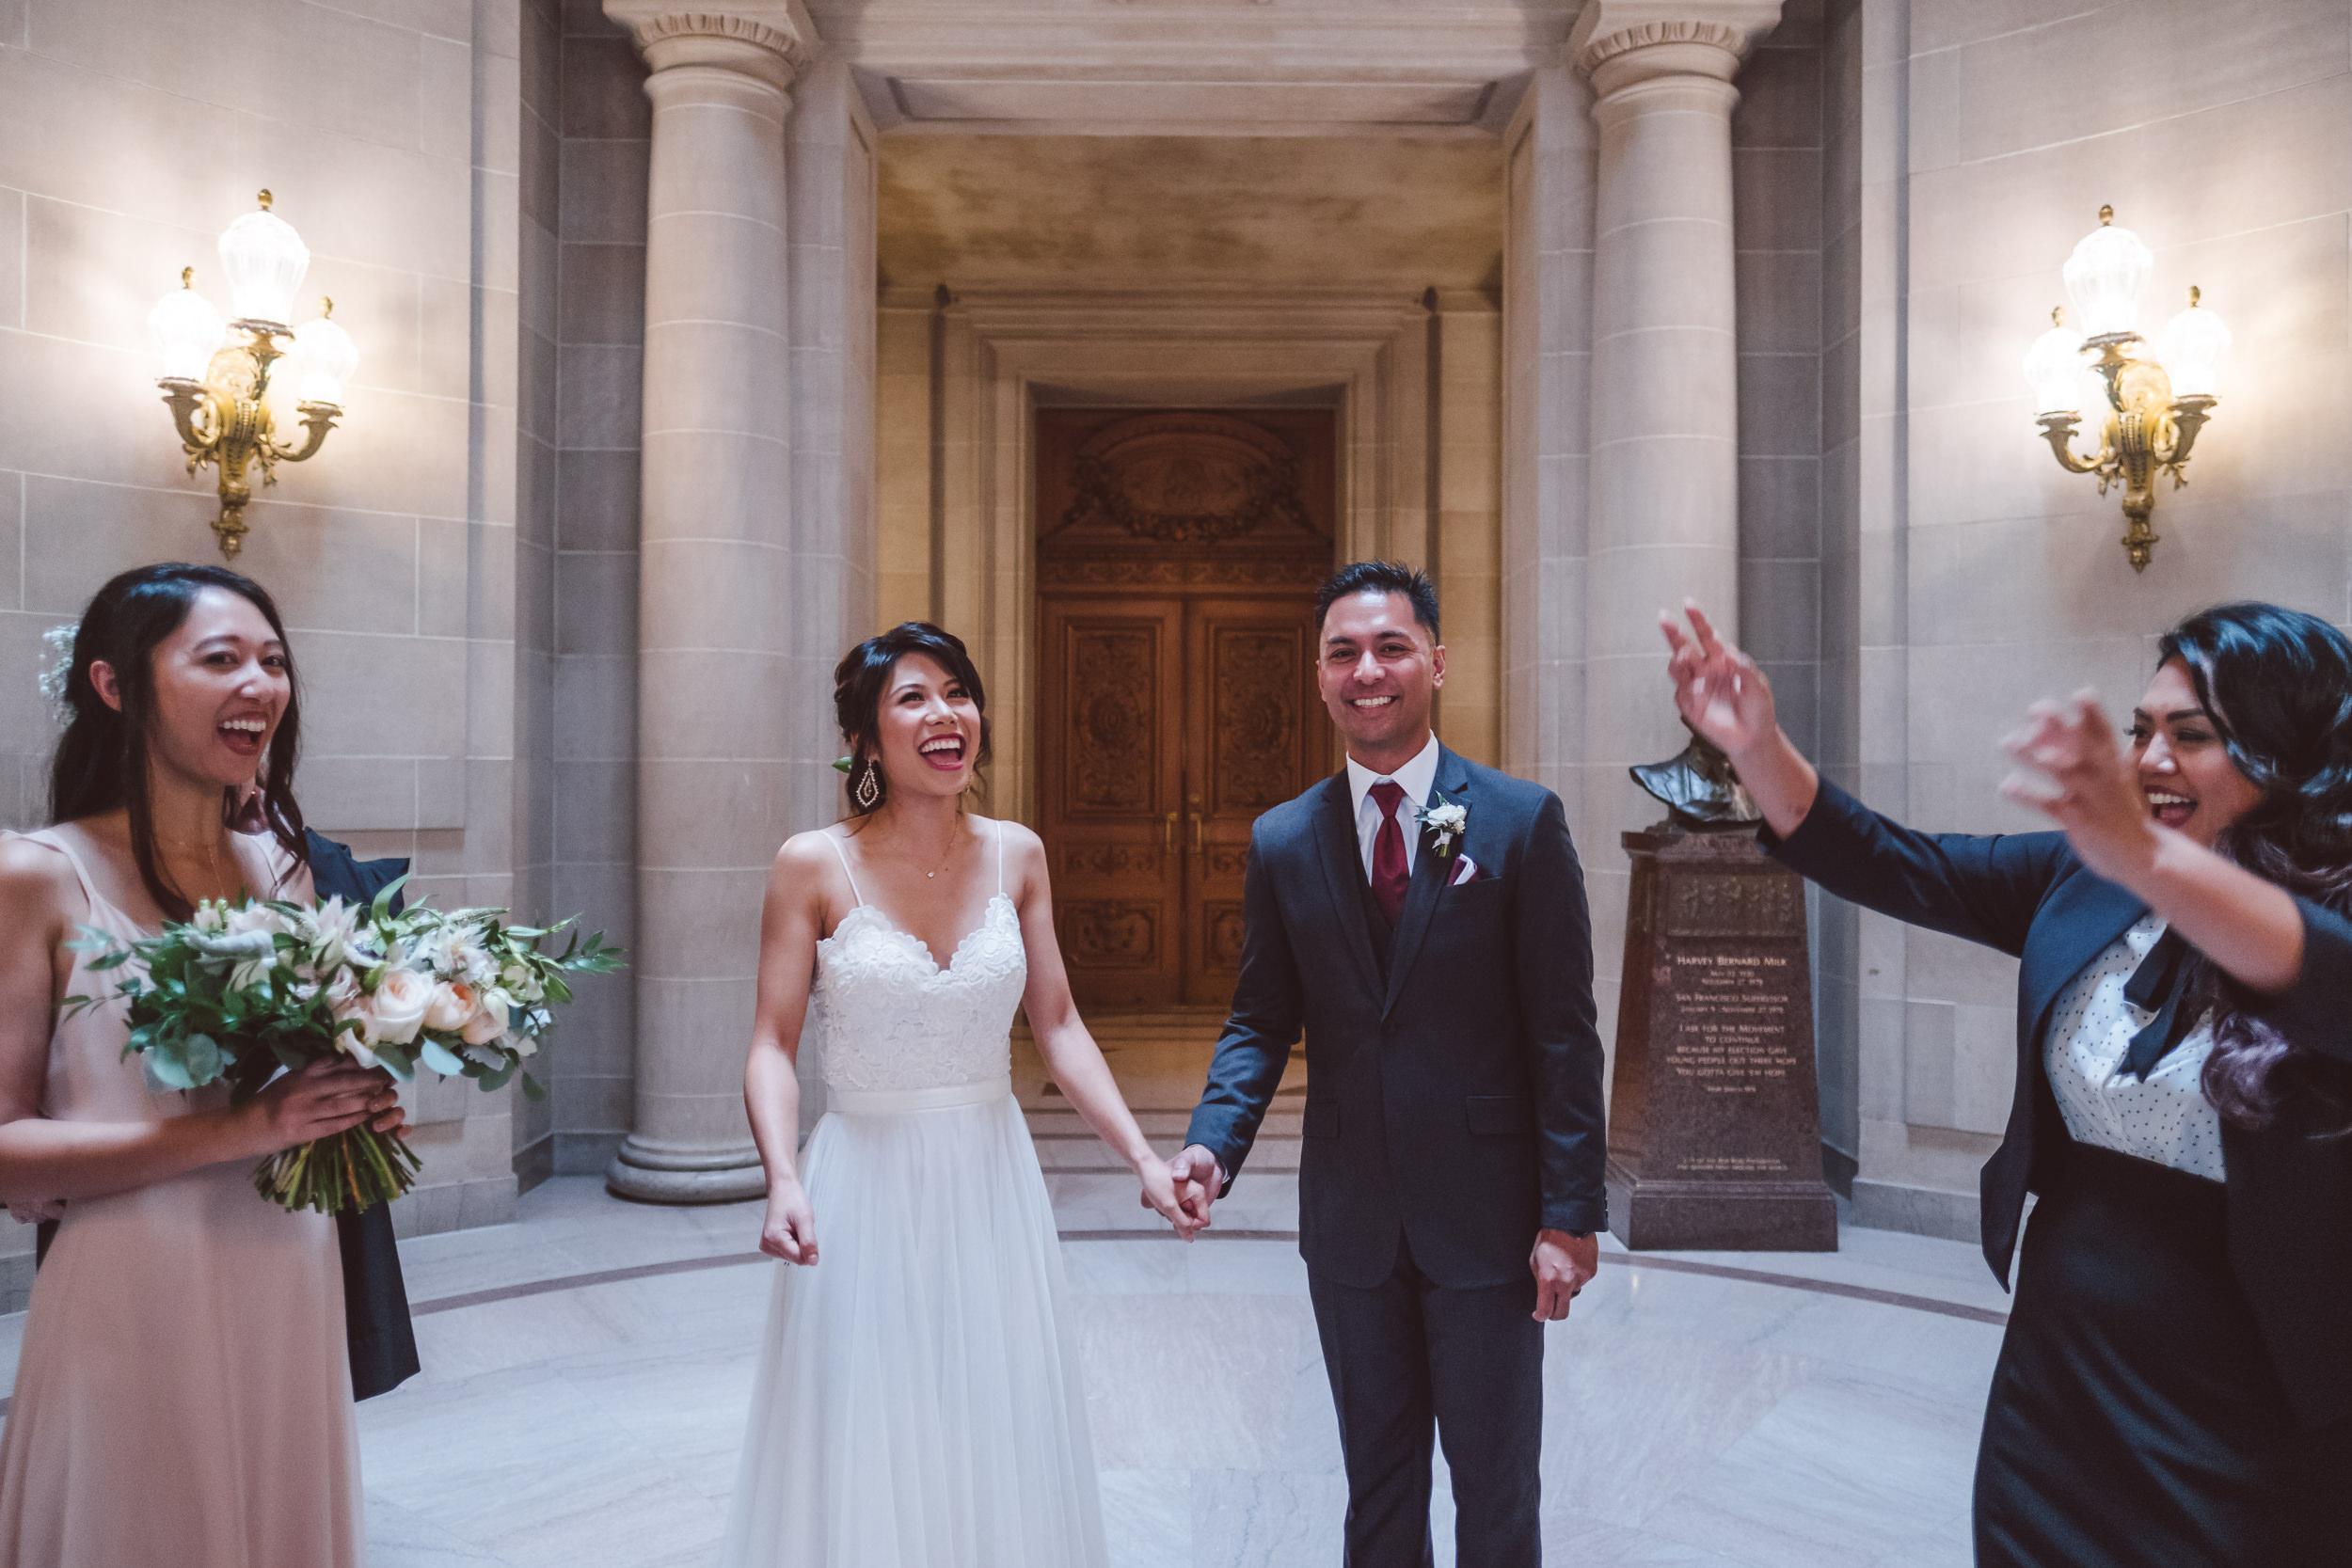 San-Francisco-City-Hall-Wedding-Photography-052.jpg